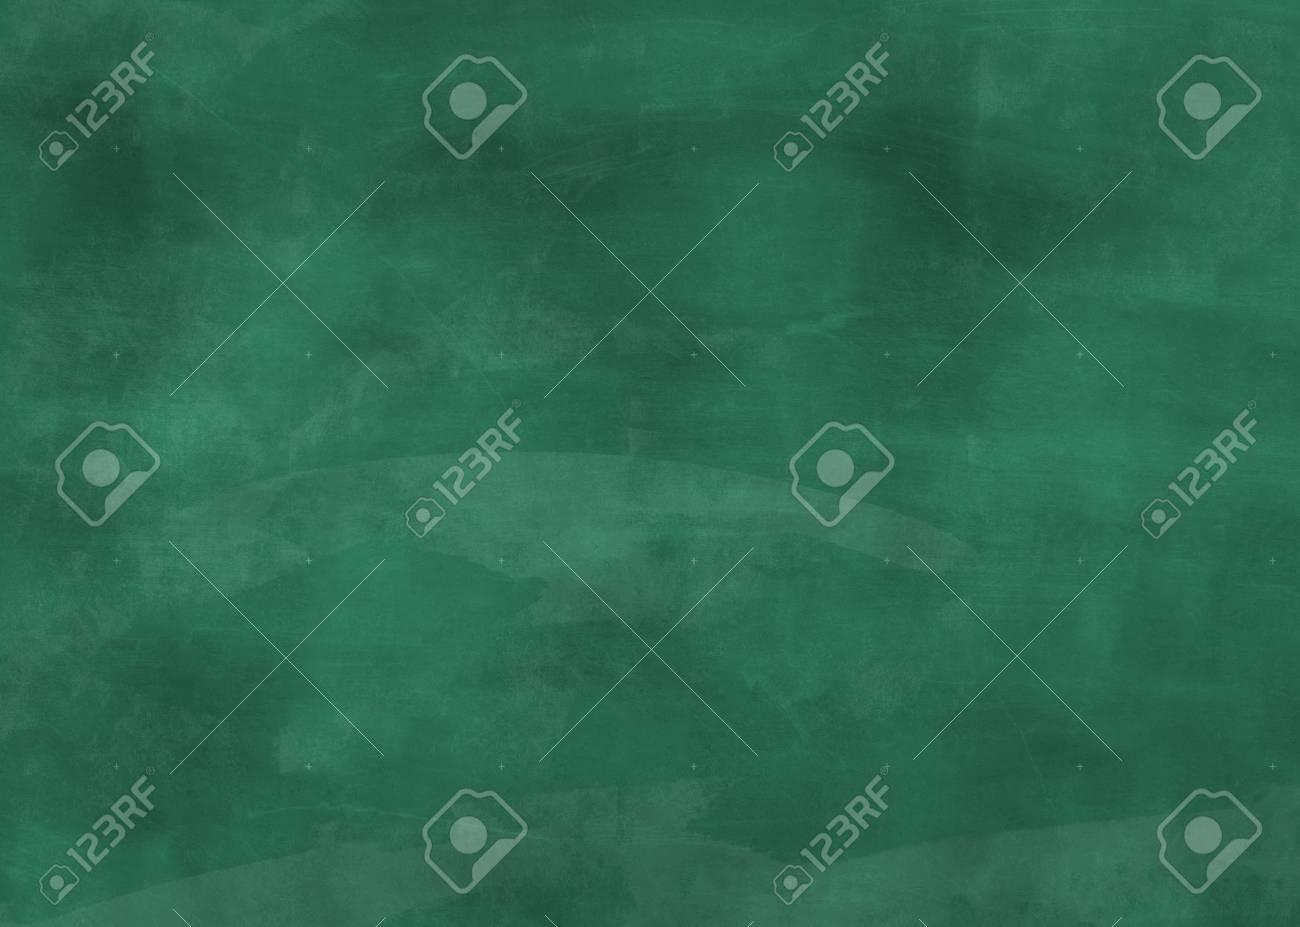 Blank Green Chalkboard Background With Chalk Dust Design Template Standard Bild